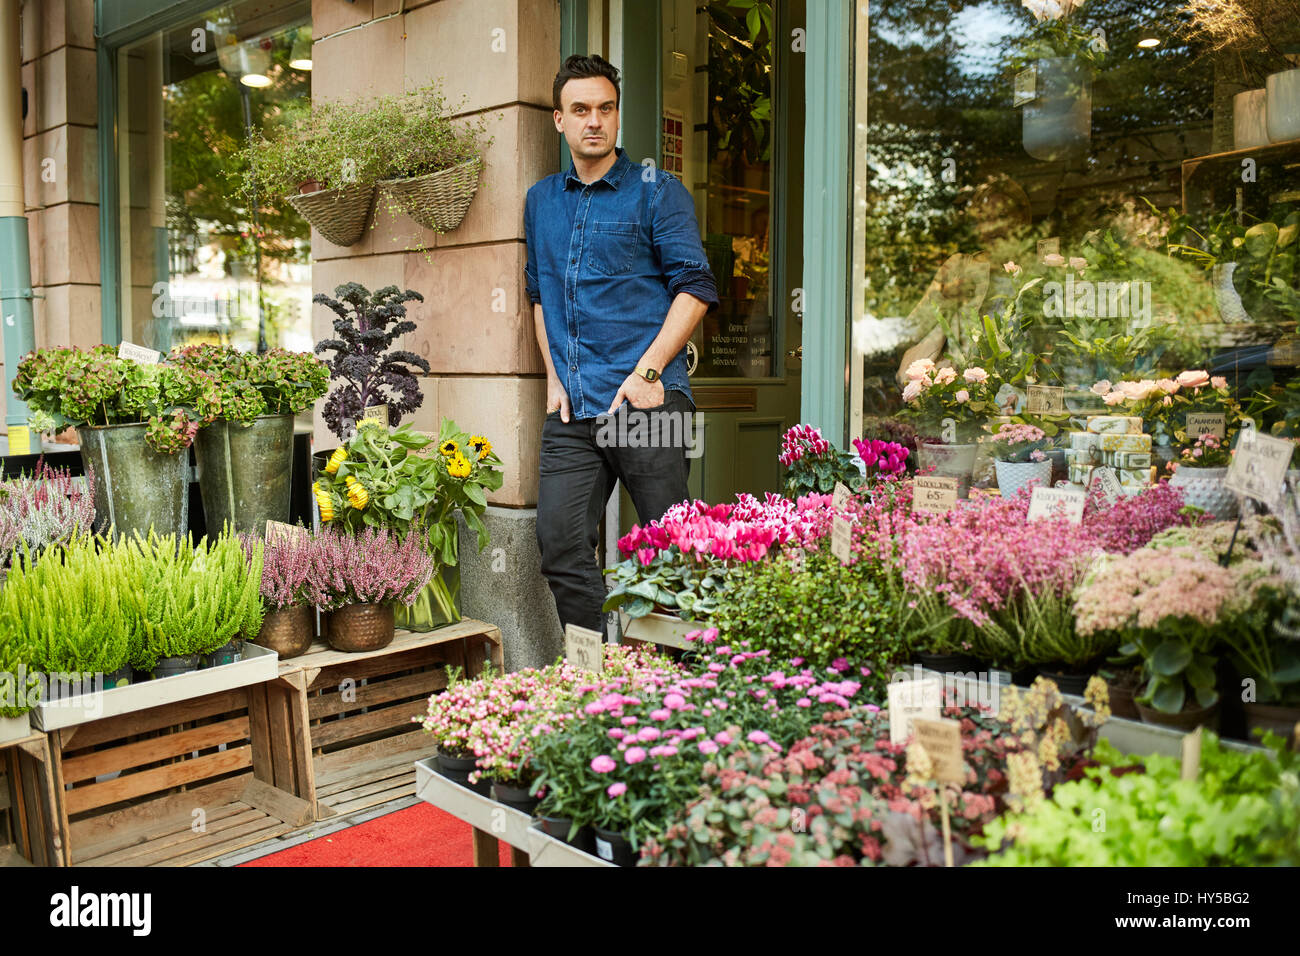 Sweden, Florist standing in front of entrance of flower shop - Stock Image